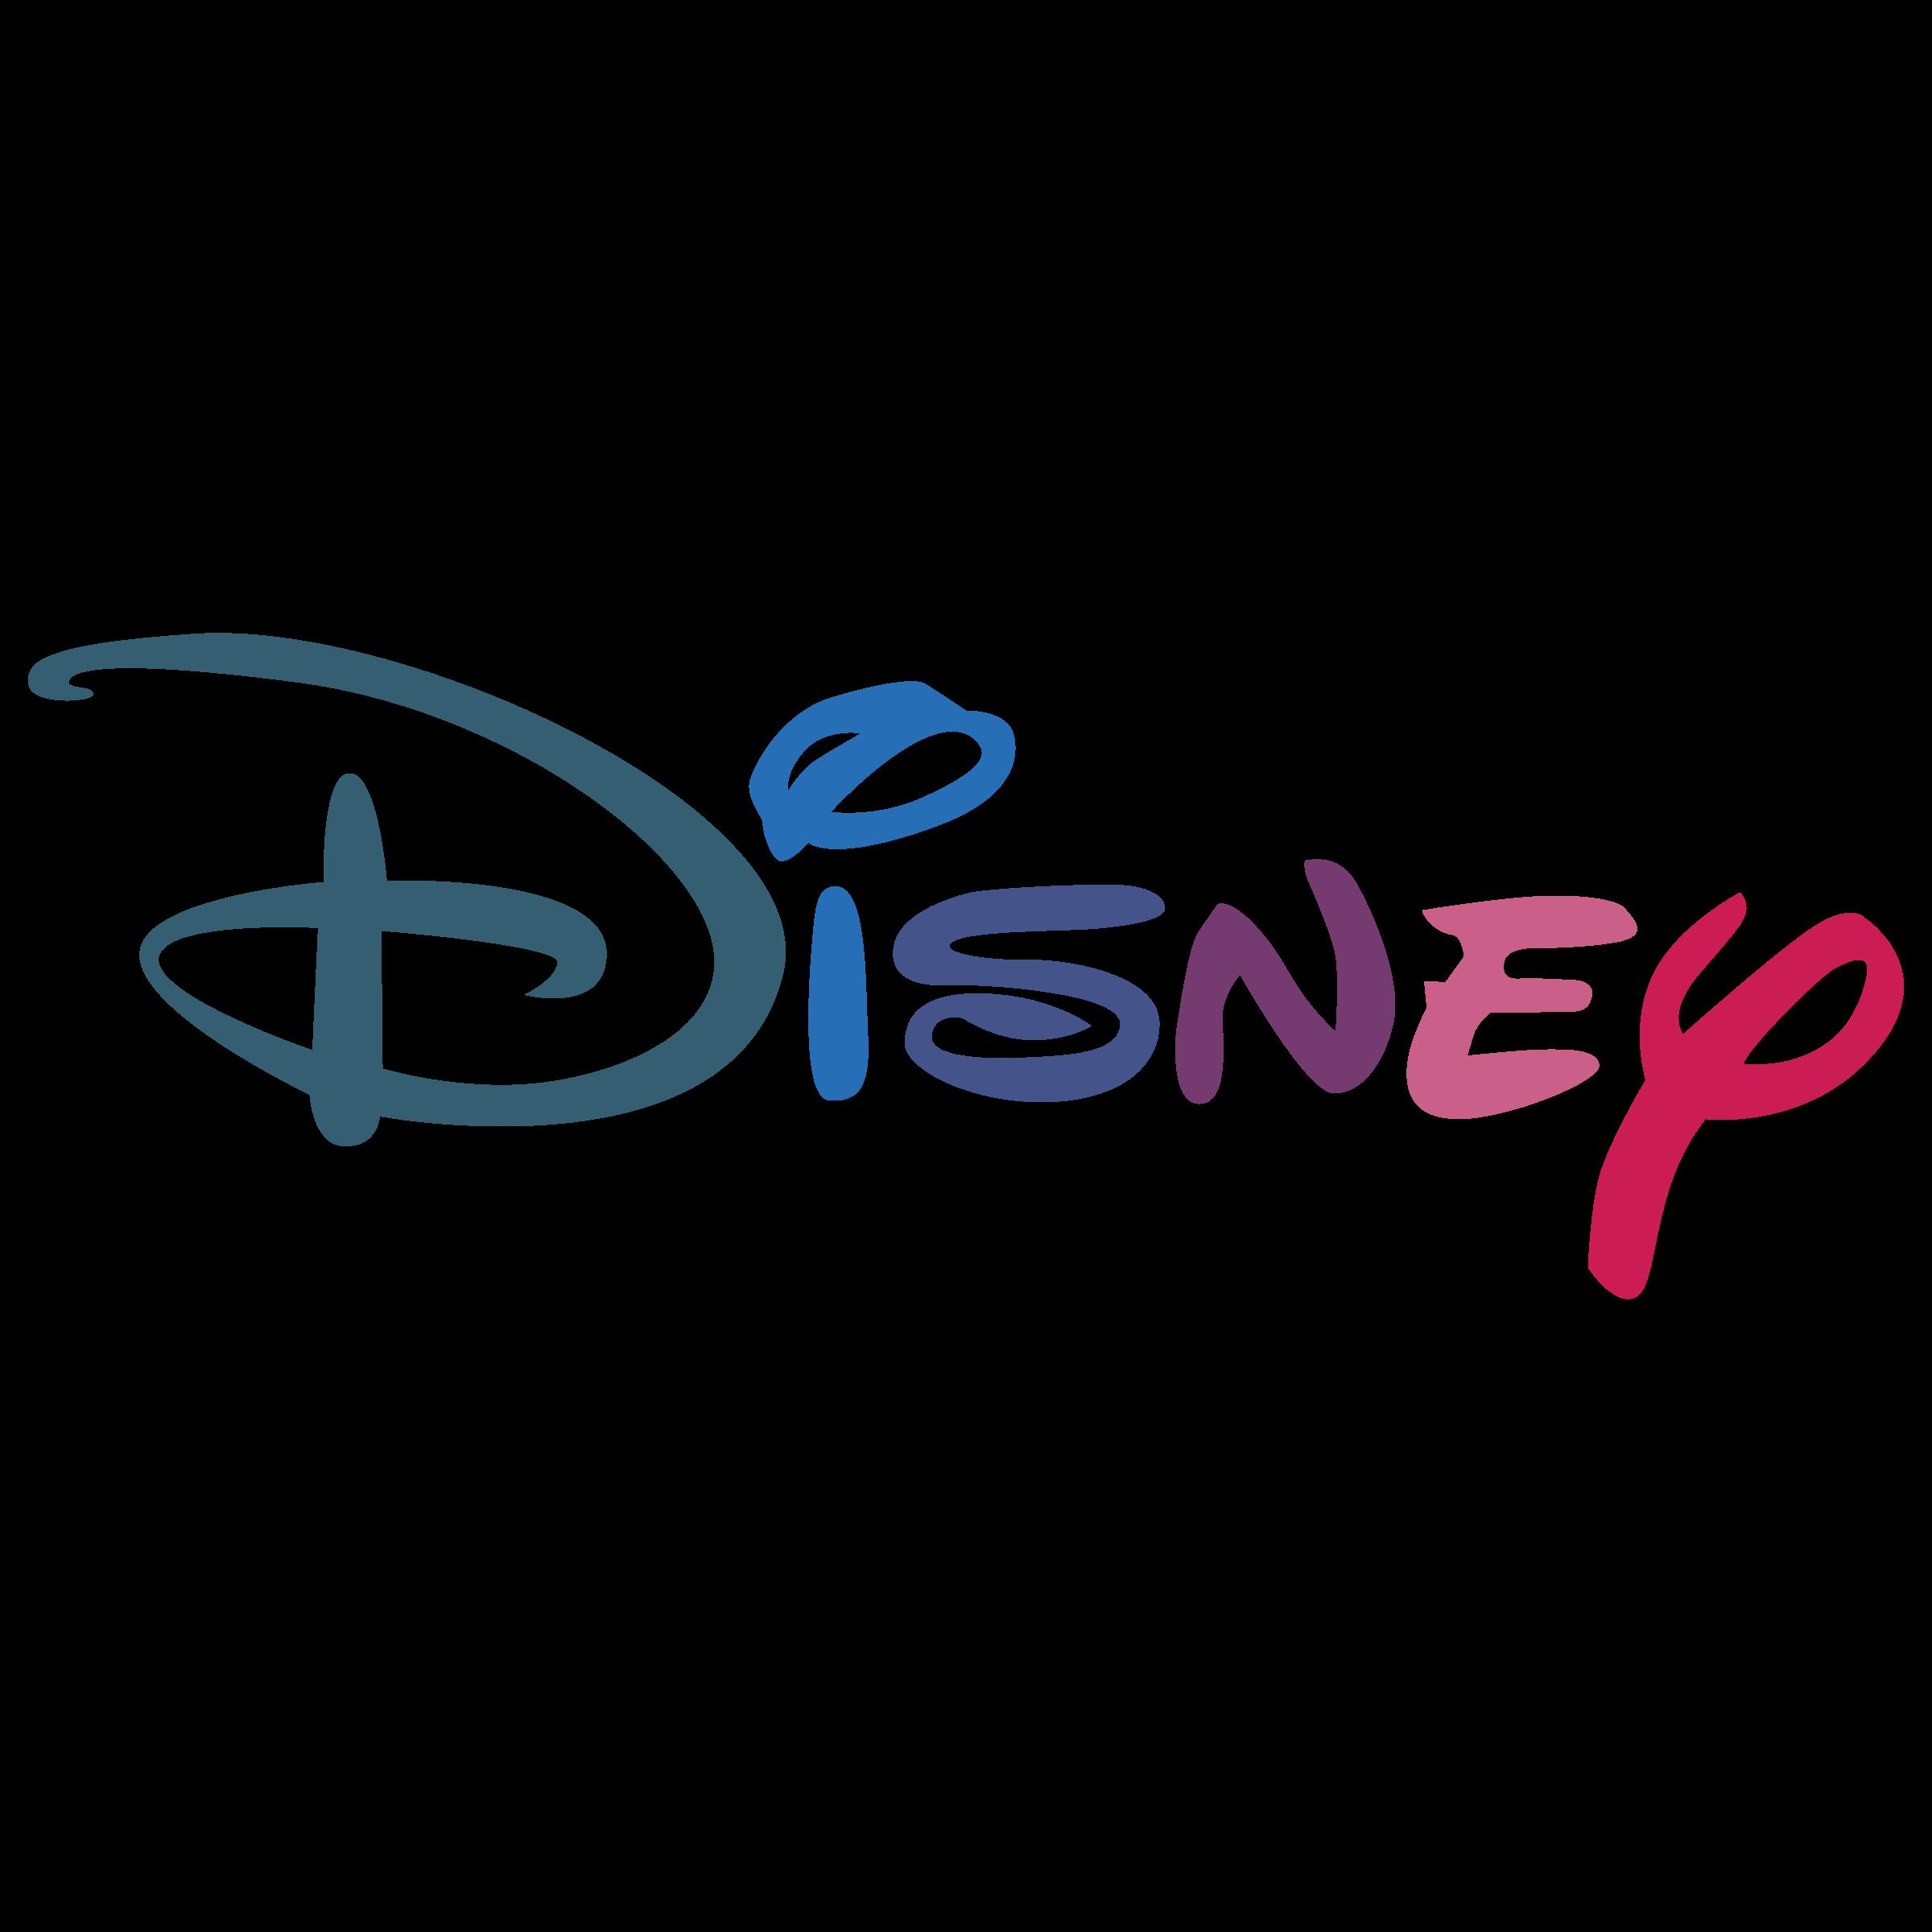 disney-1-logo-png-transparent.png